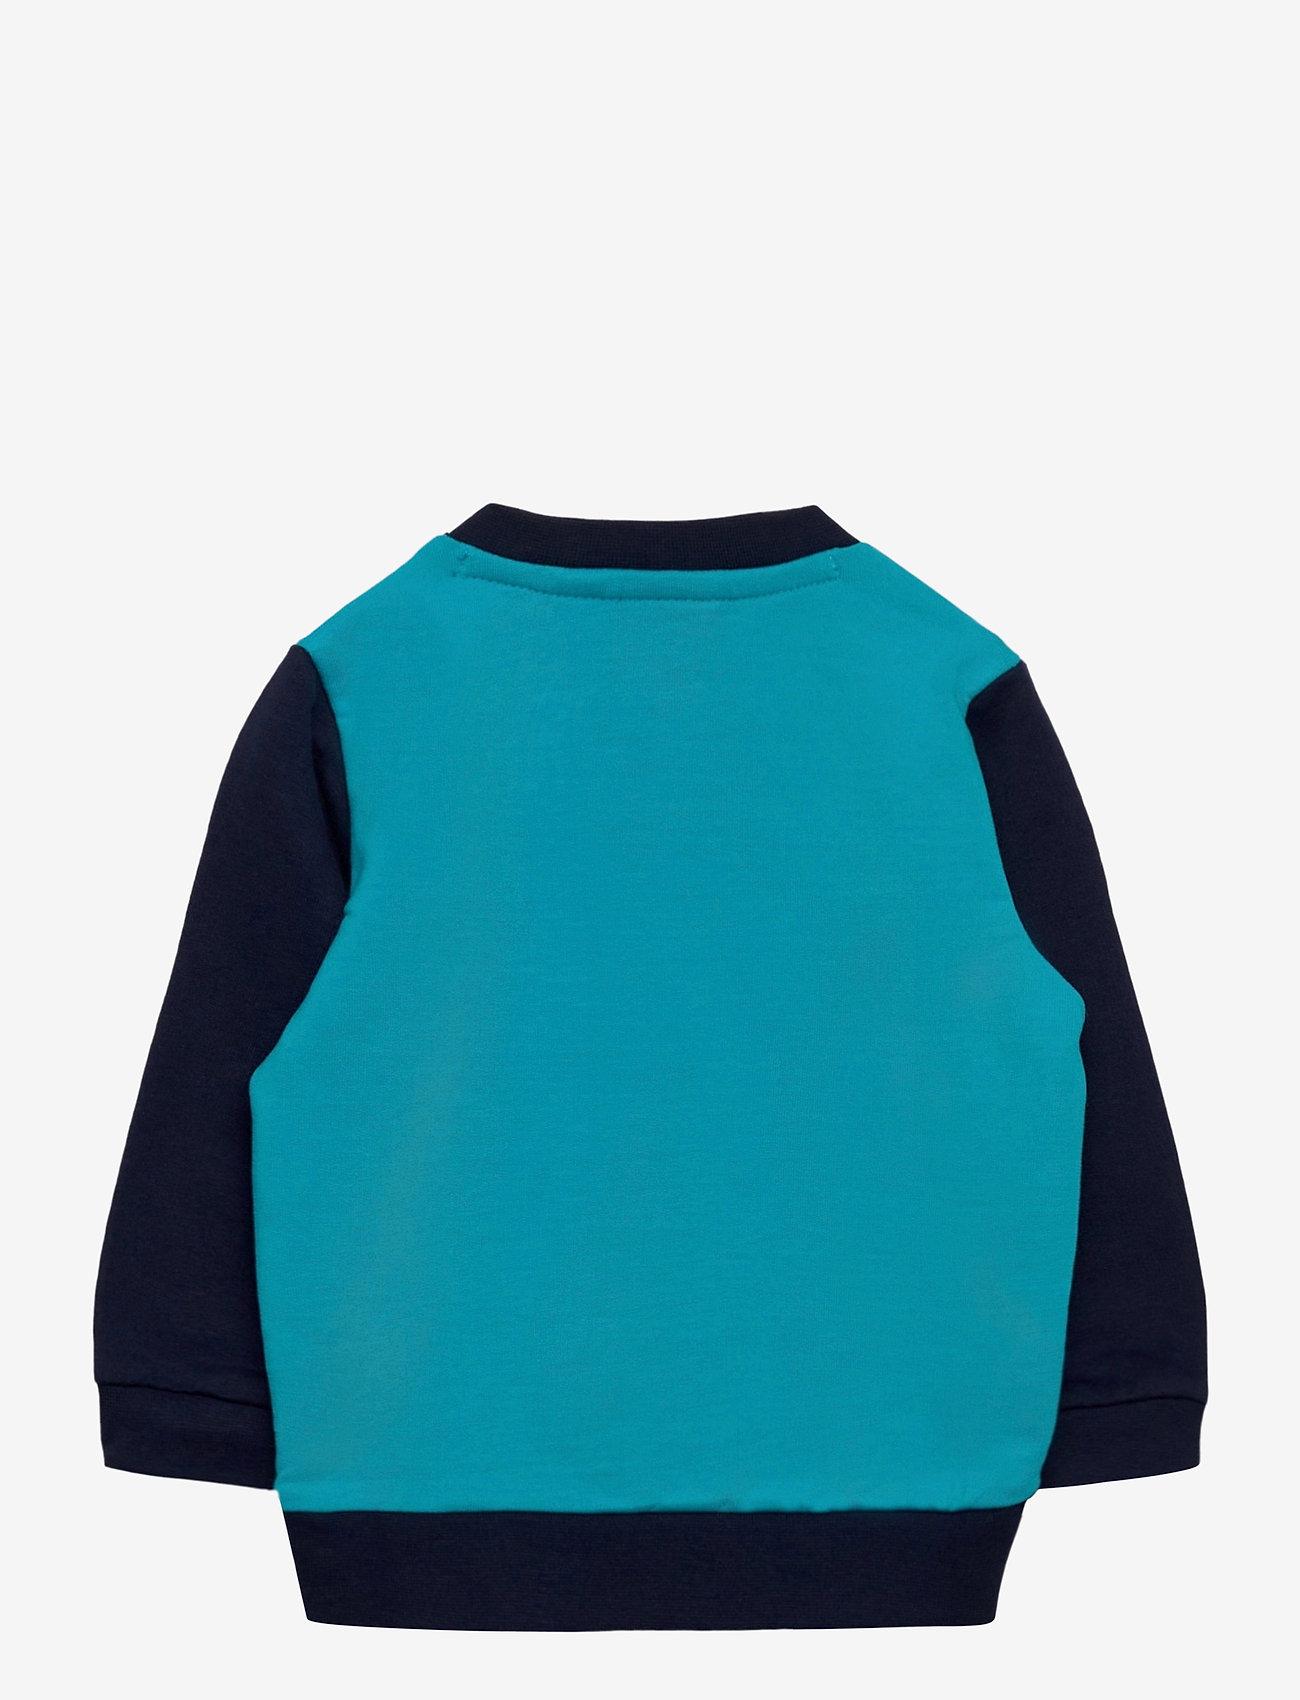 Hummel - hmlVILLADS SWEATSHIRT - sweatshirts - black iris - 1